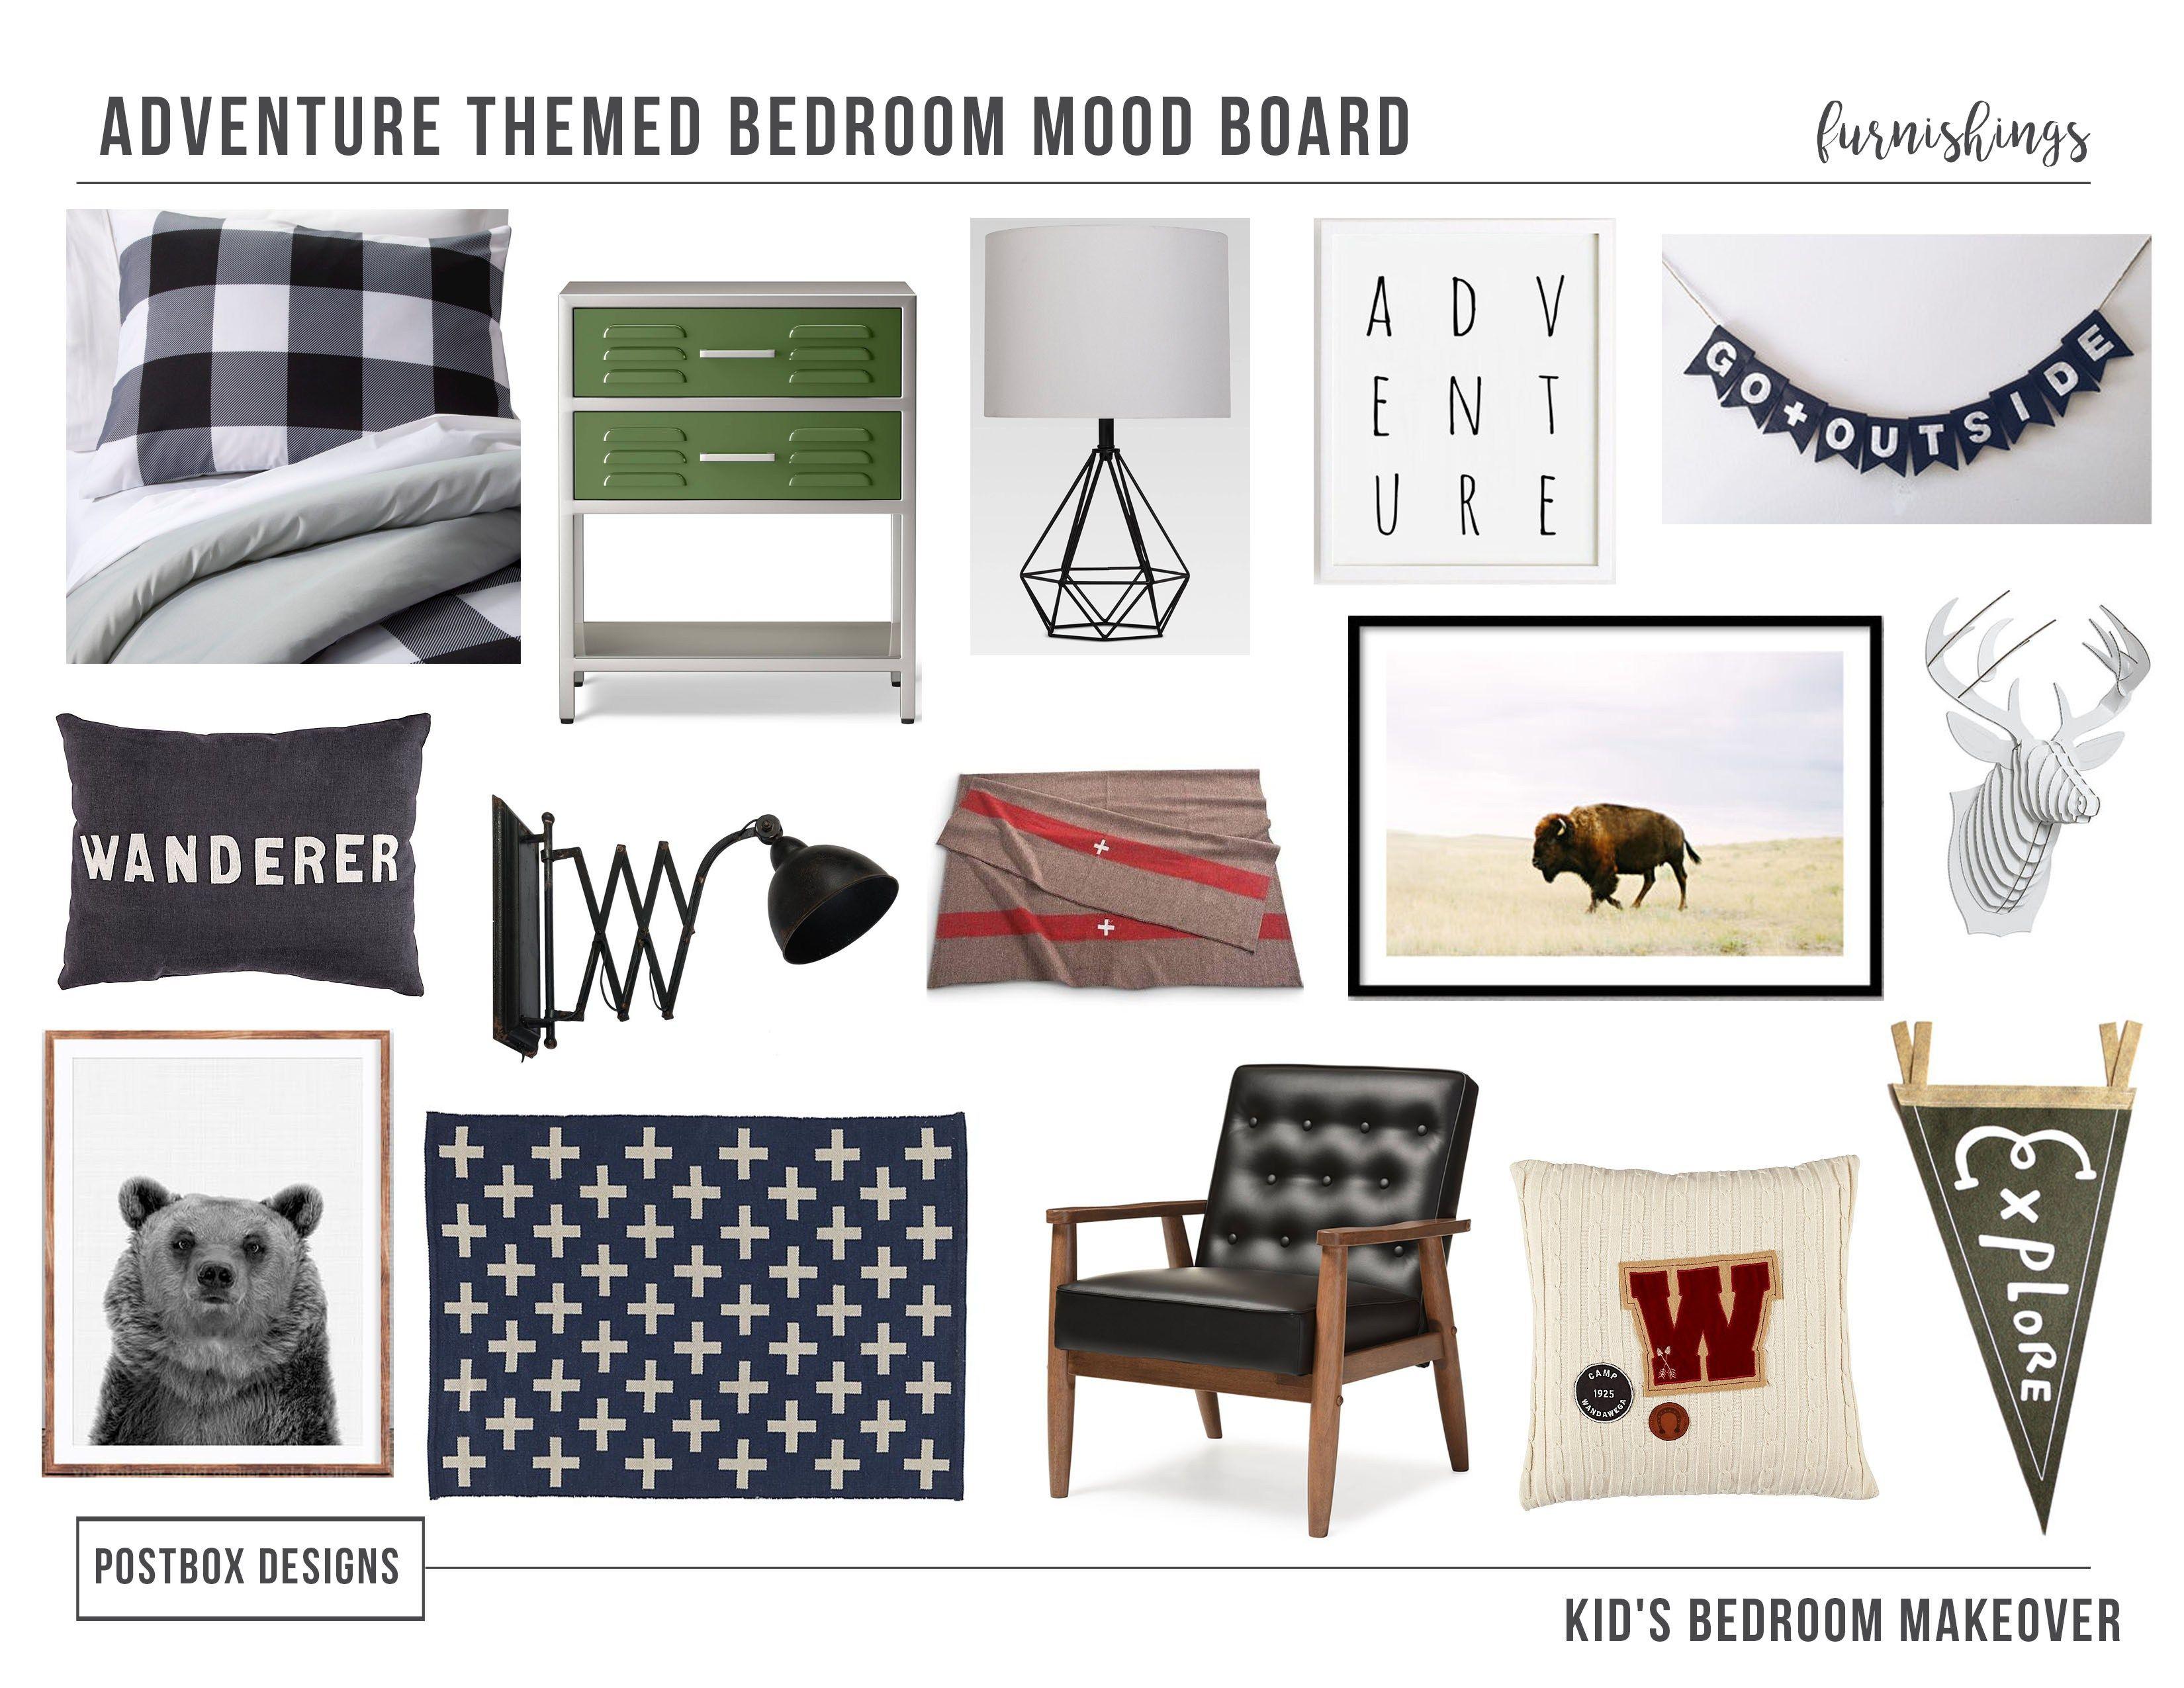 Postbox Designs E Design One Room Challenge Boy S Adventure Themed Makeover Camp Bedroom Decor Ideas